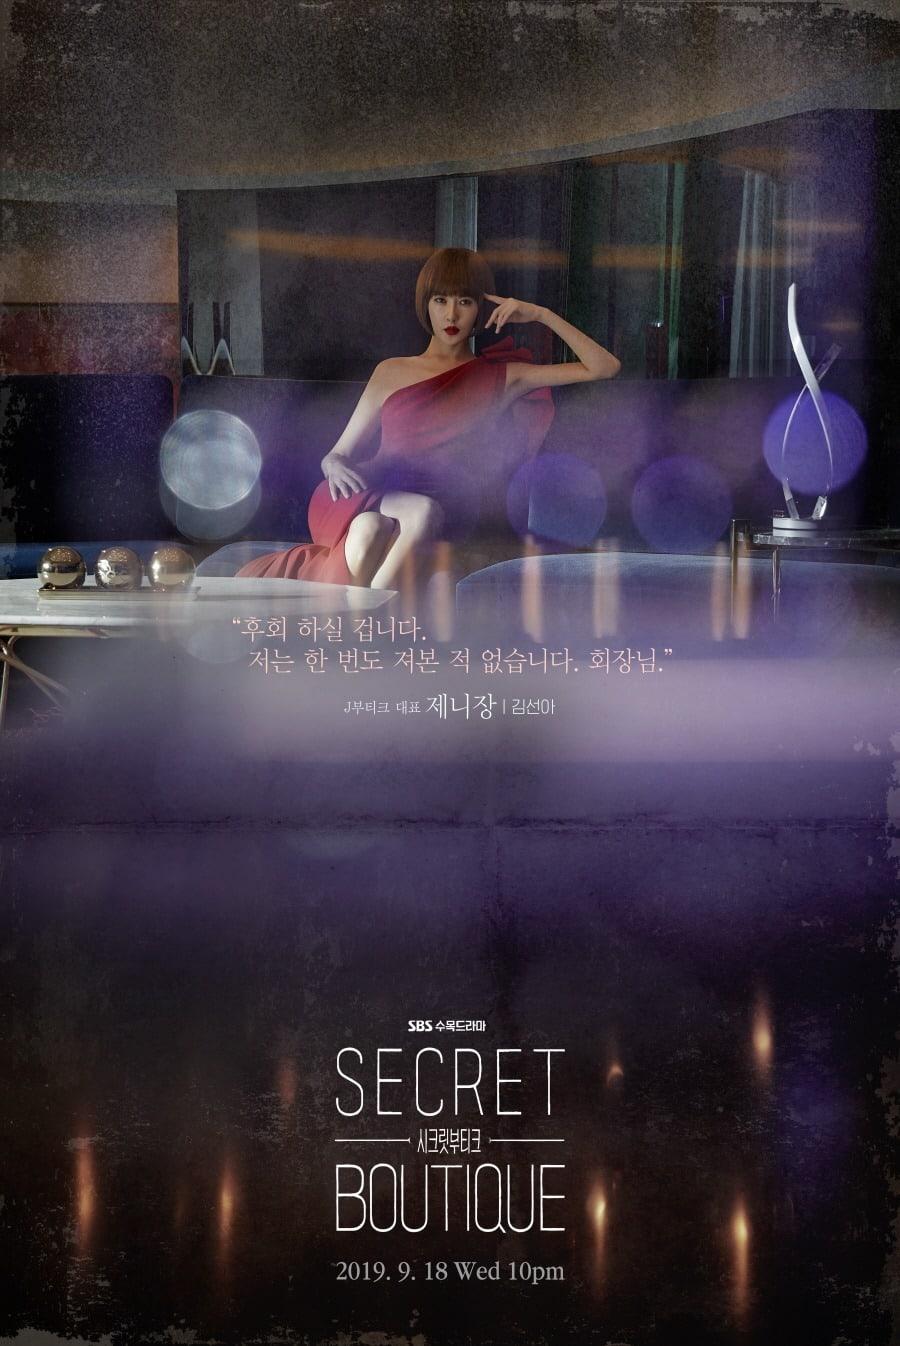 kim-sun-ah-secret-boutique.jpg